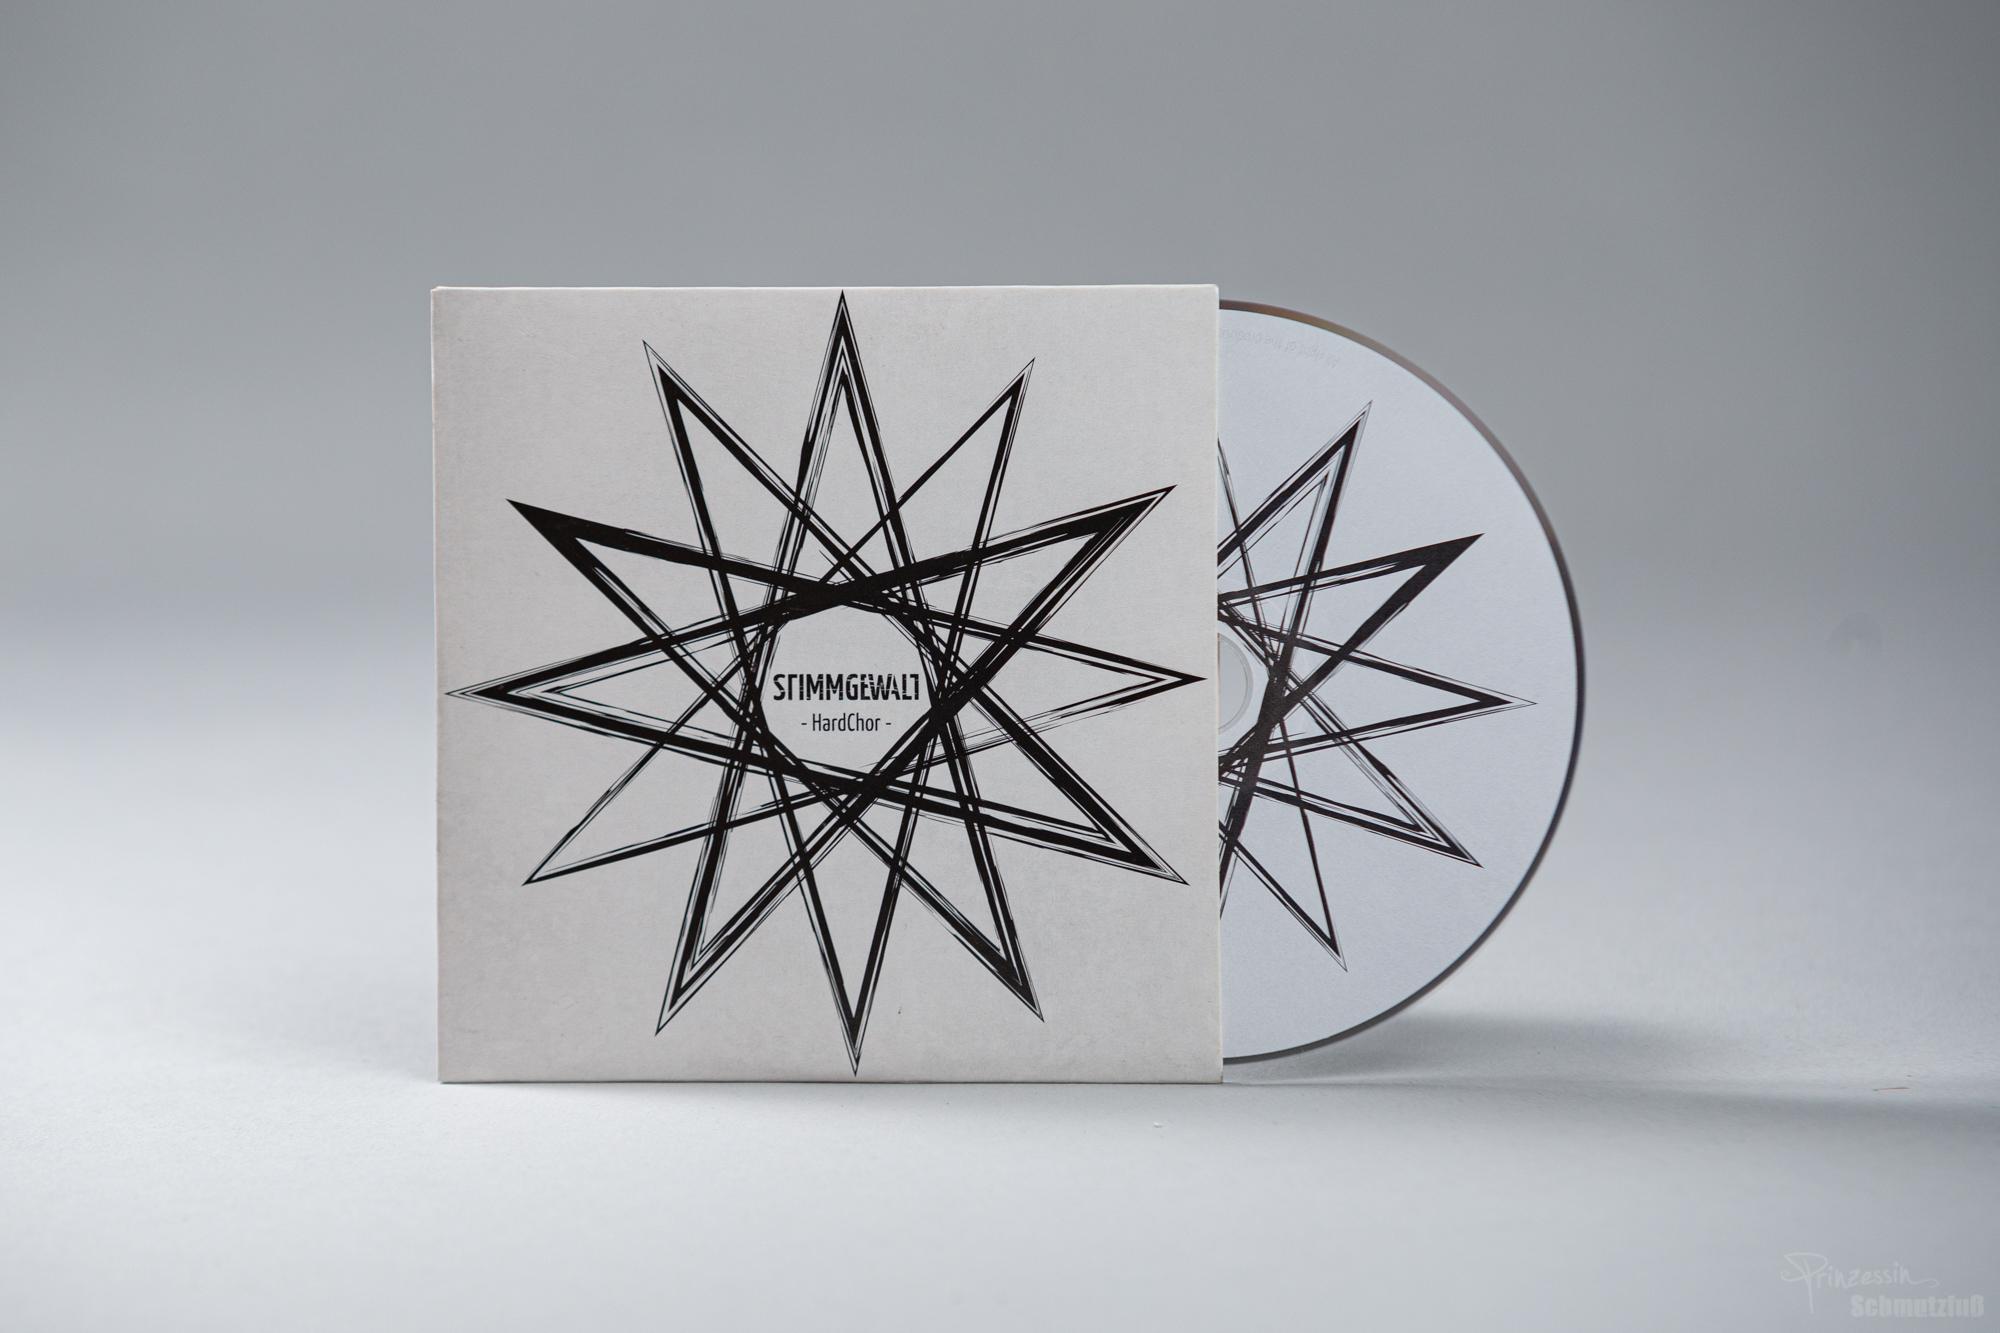 CD-Gestaltung | Logogestaltung | Stimmgewalt HardChor